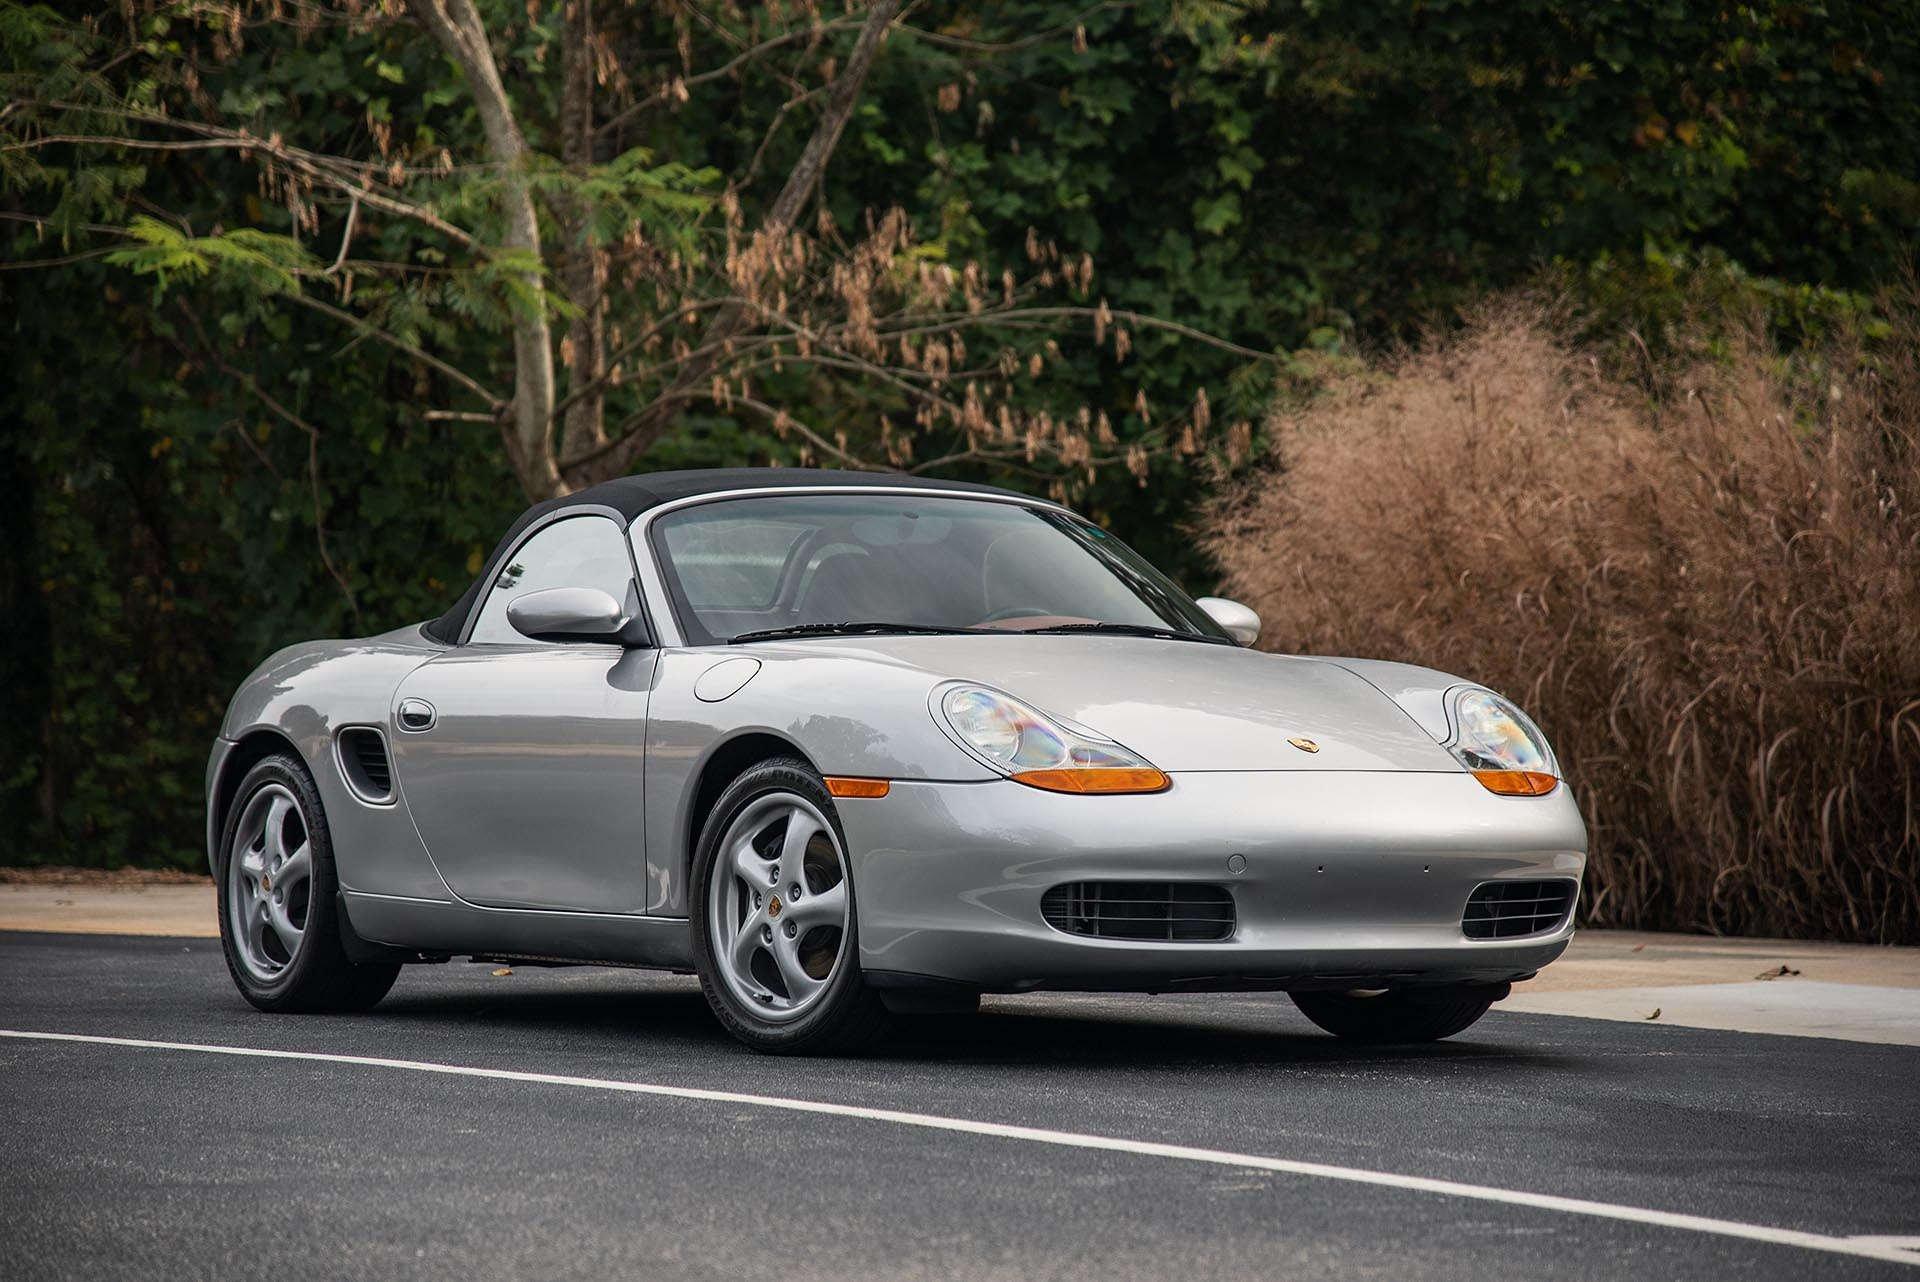 04_986 Porsche Boxster Front